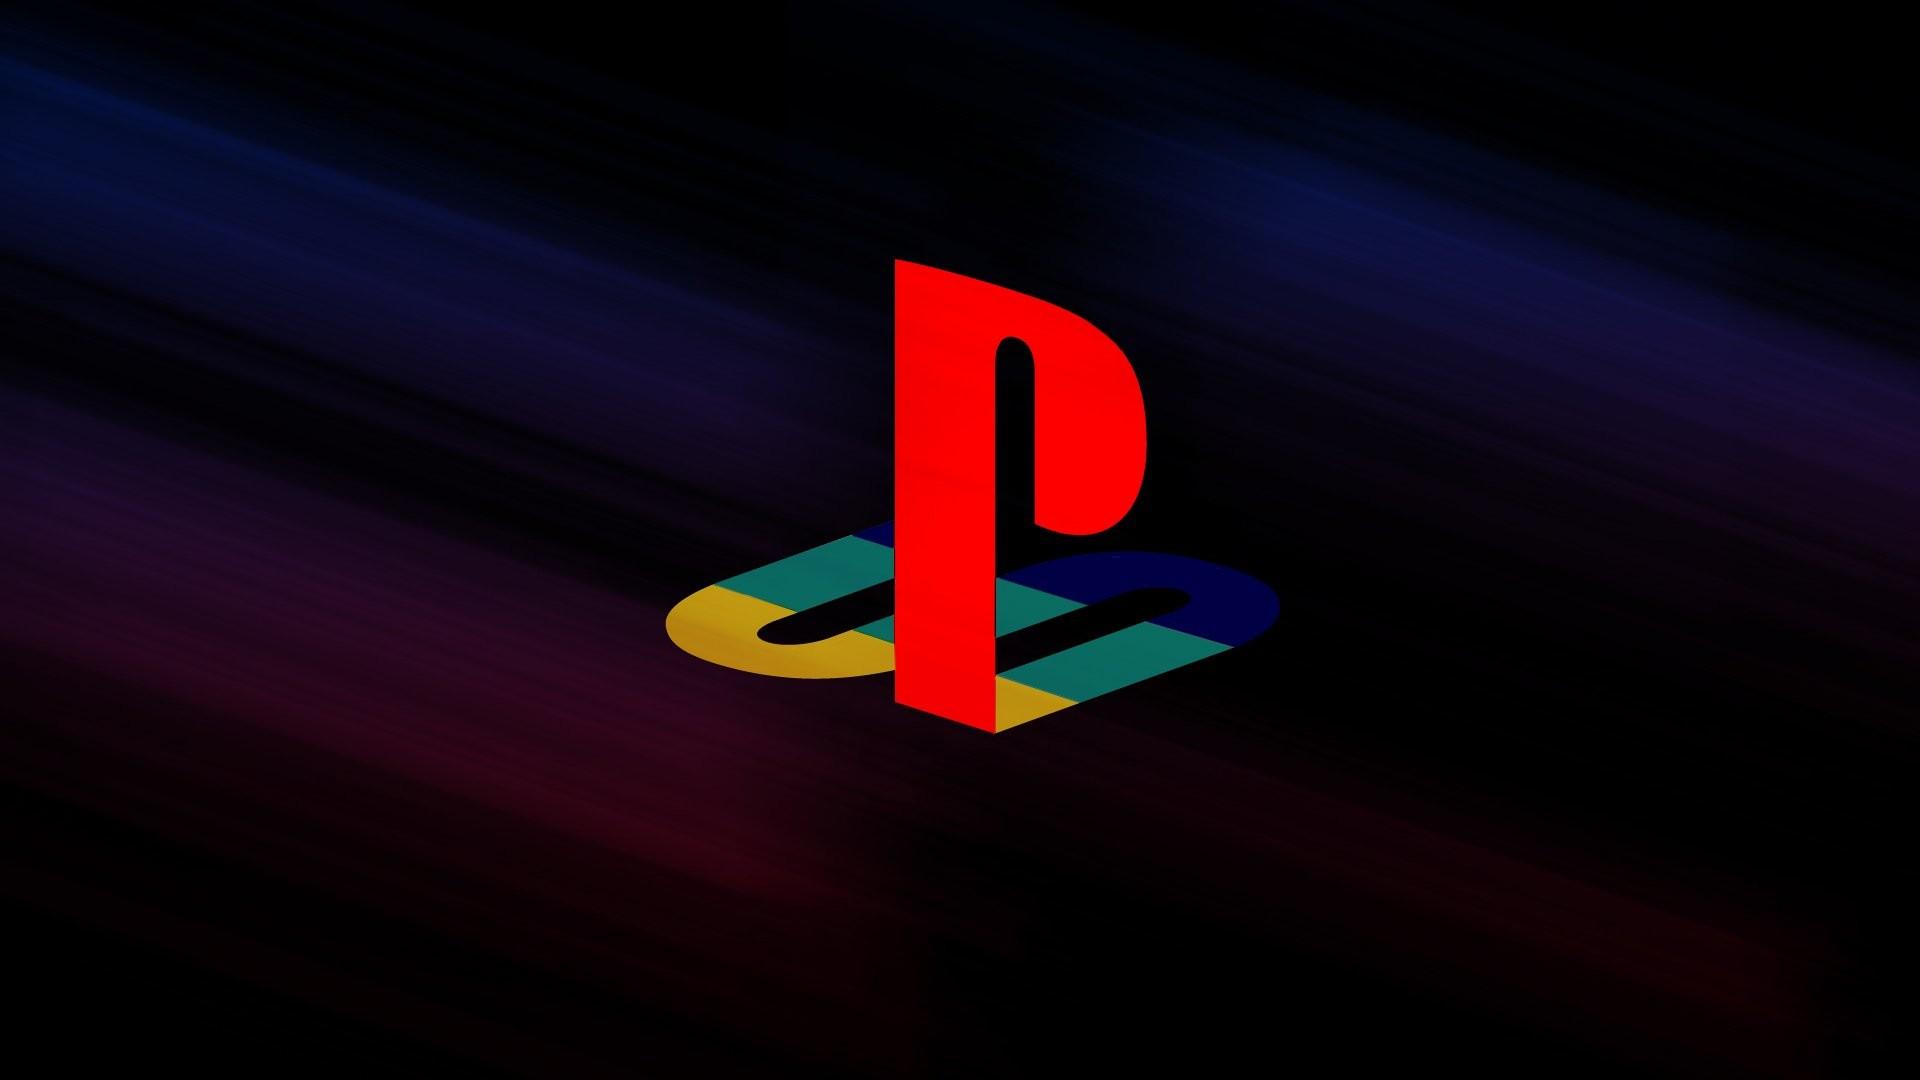 Ps3 Logo Wallpaper » WallDevil – Best free HD desktop and mobile .